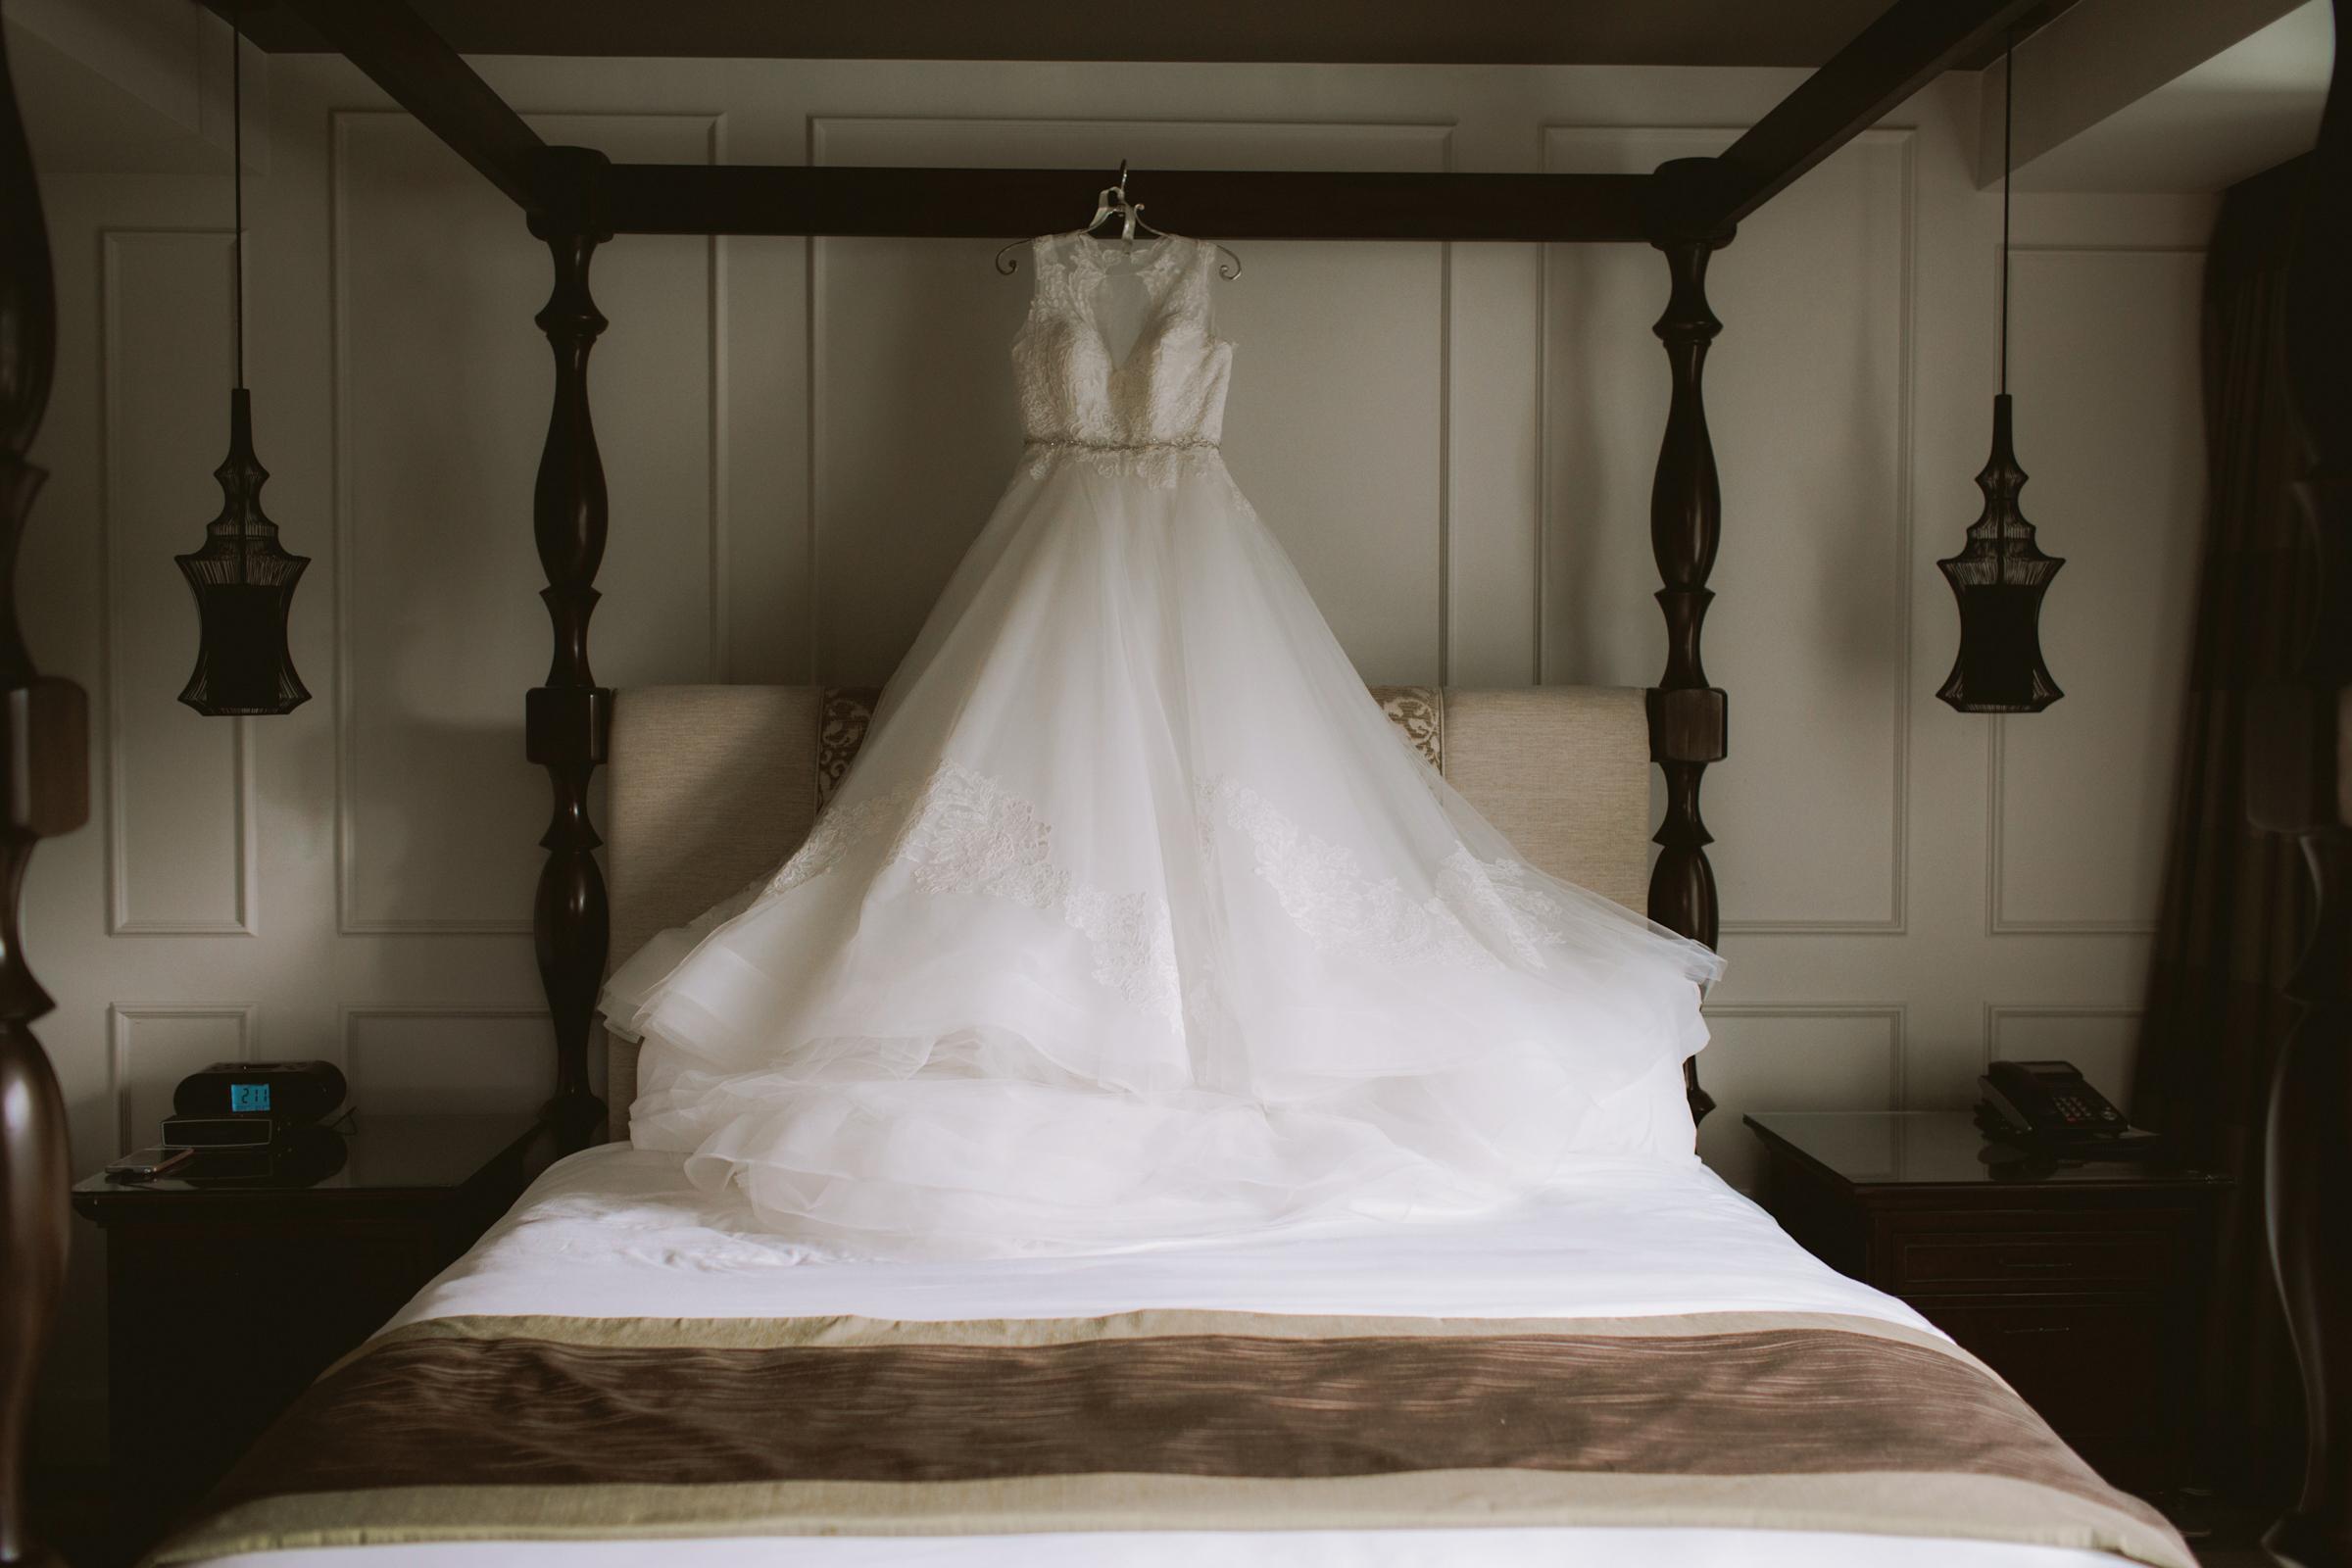 wedding day | MFA St Pete | Vanessa Boy Photography | vanessaboy.com-31.com |final.jpg